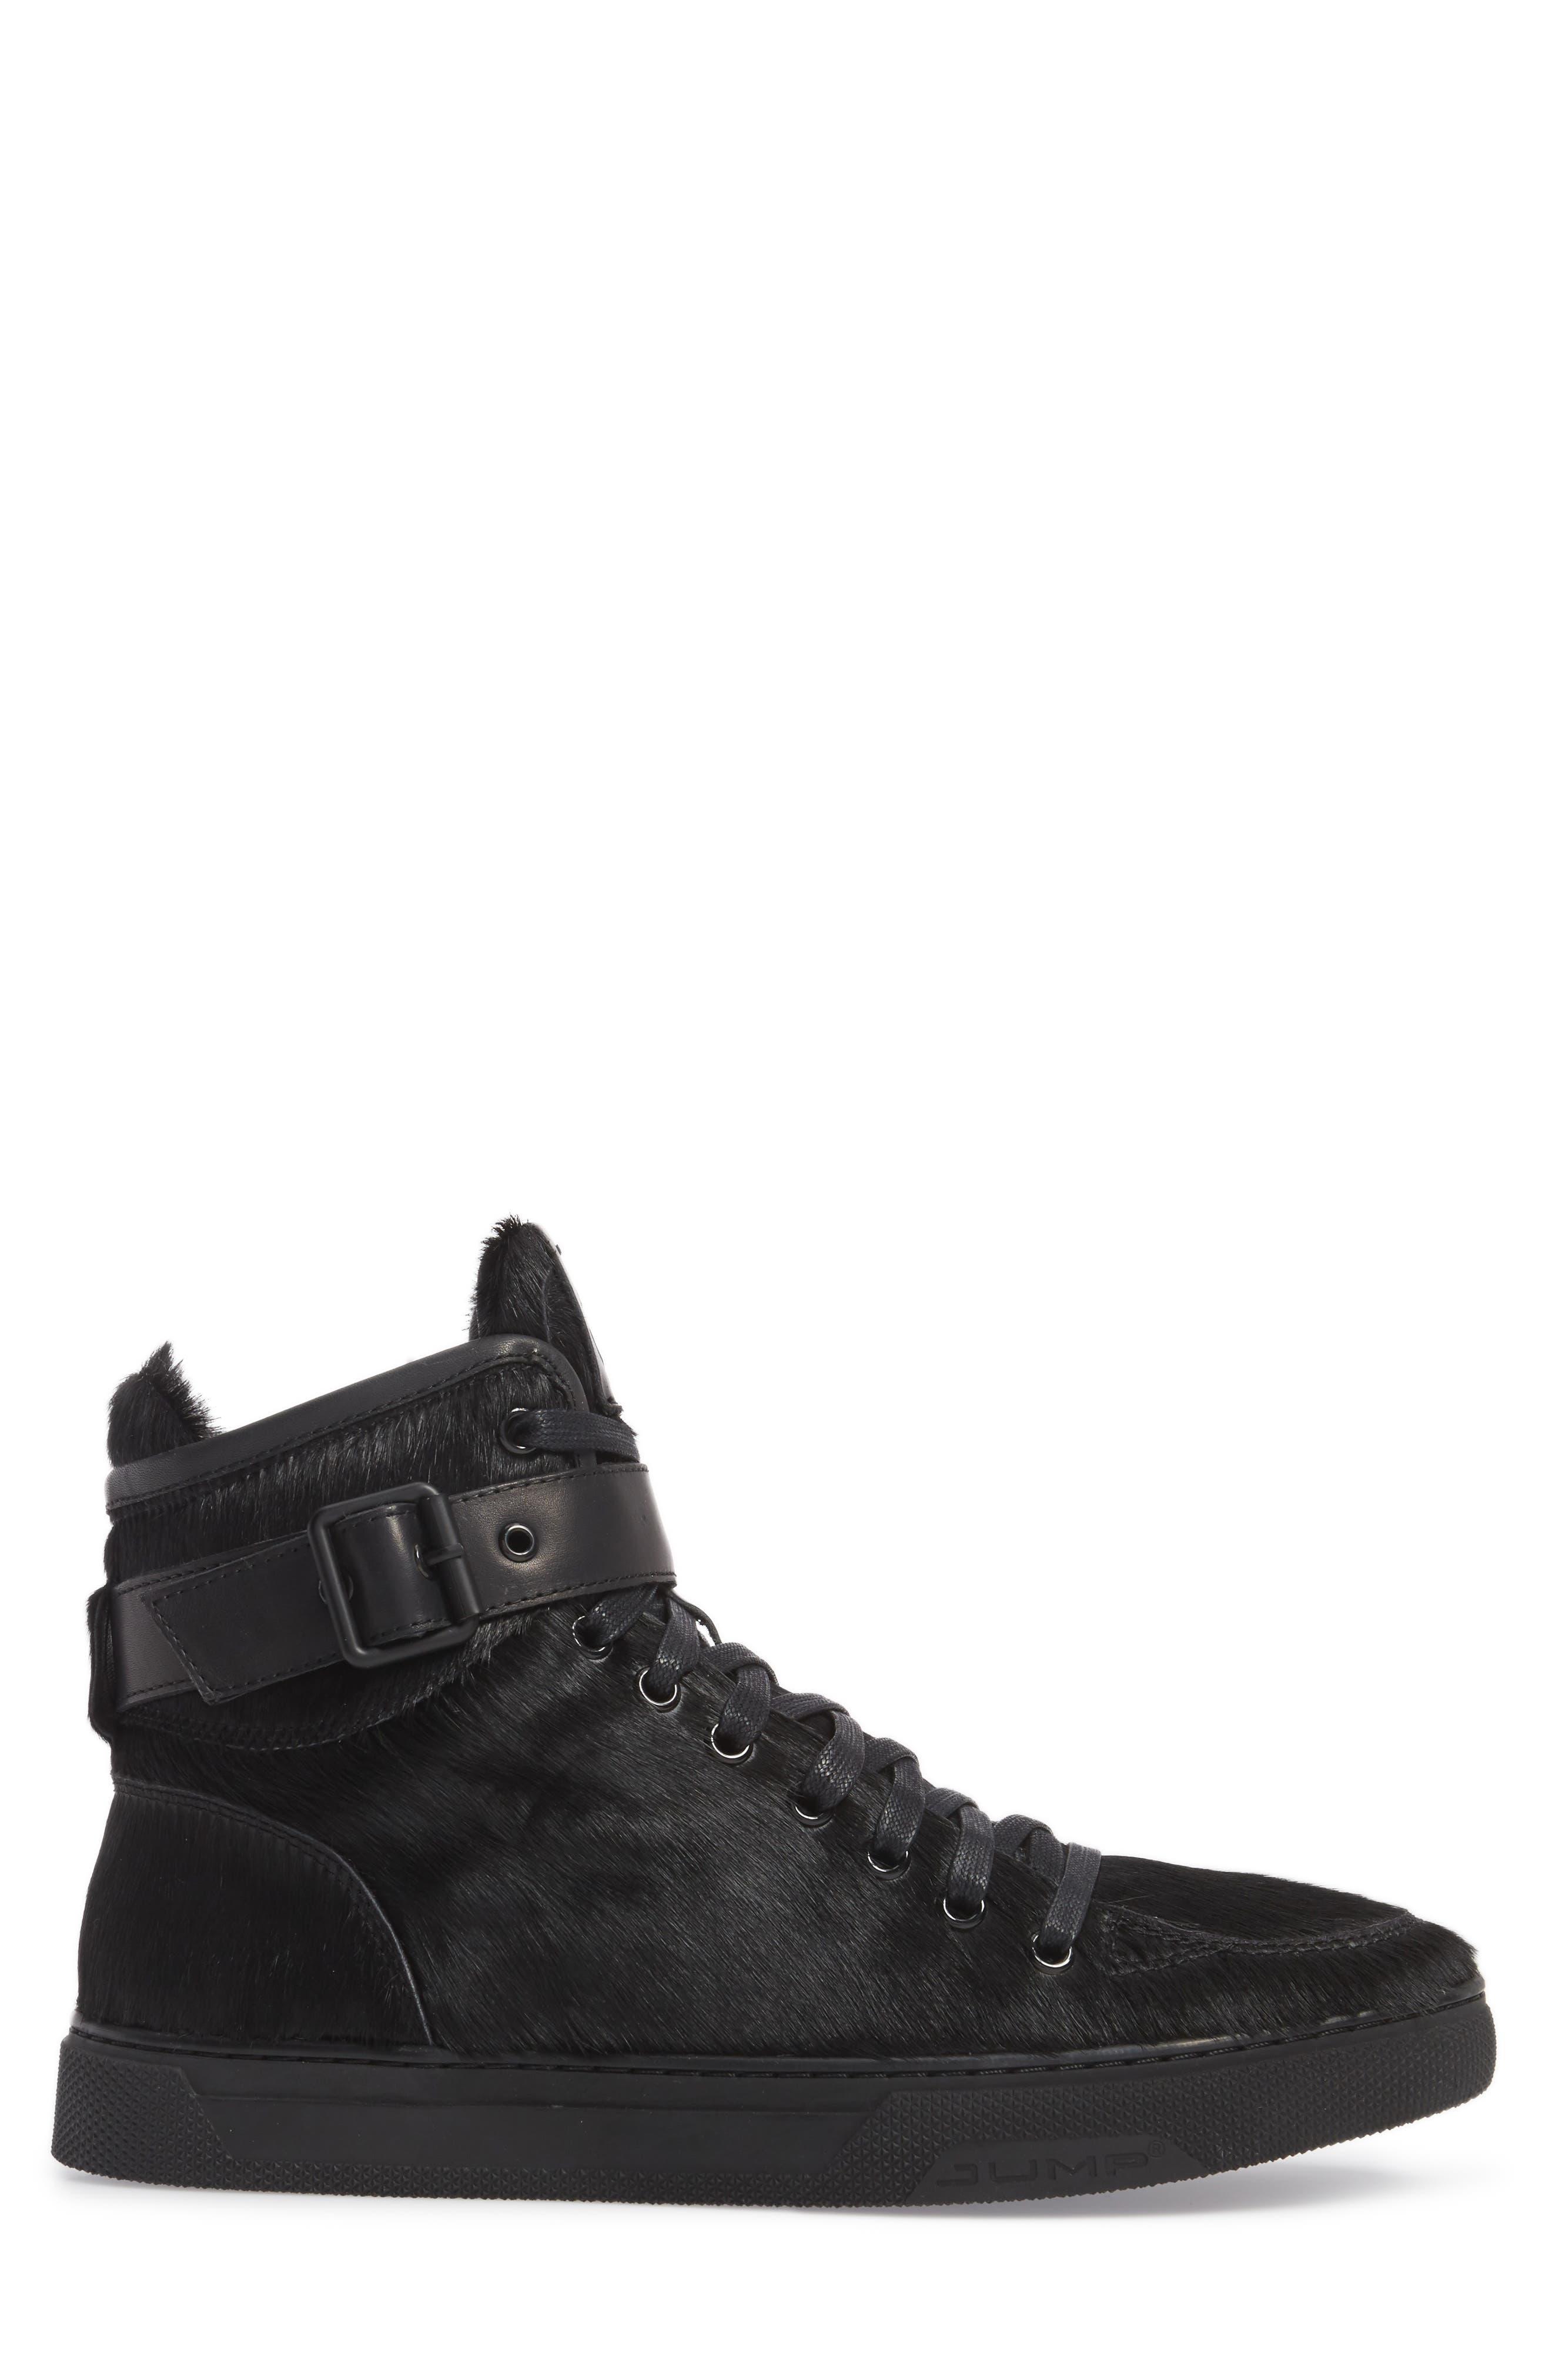 Sullivan Genuine Calf Hair High Top Sneaker,                             Alternate thumbnail 3, color,                             002